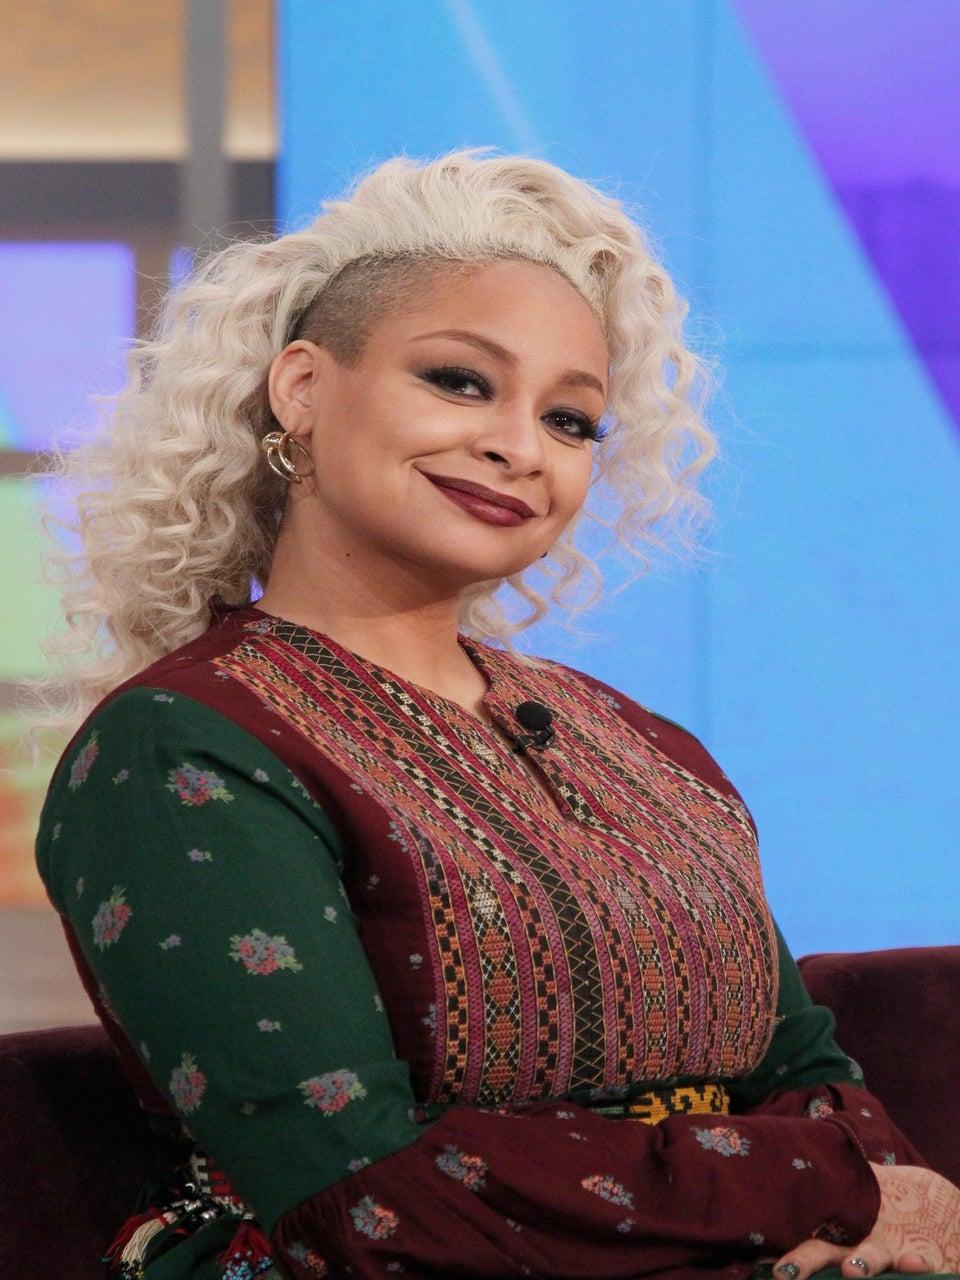 The BeyHive Attacks Raven Symoné for Calling Beyoncé's New Music Video 'Hilarious'